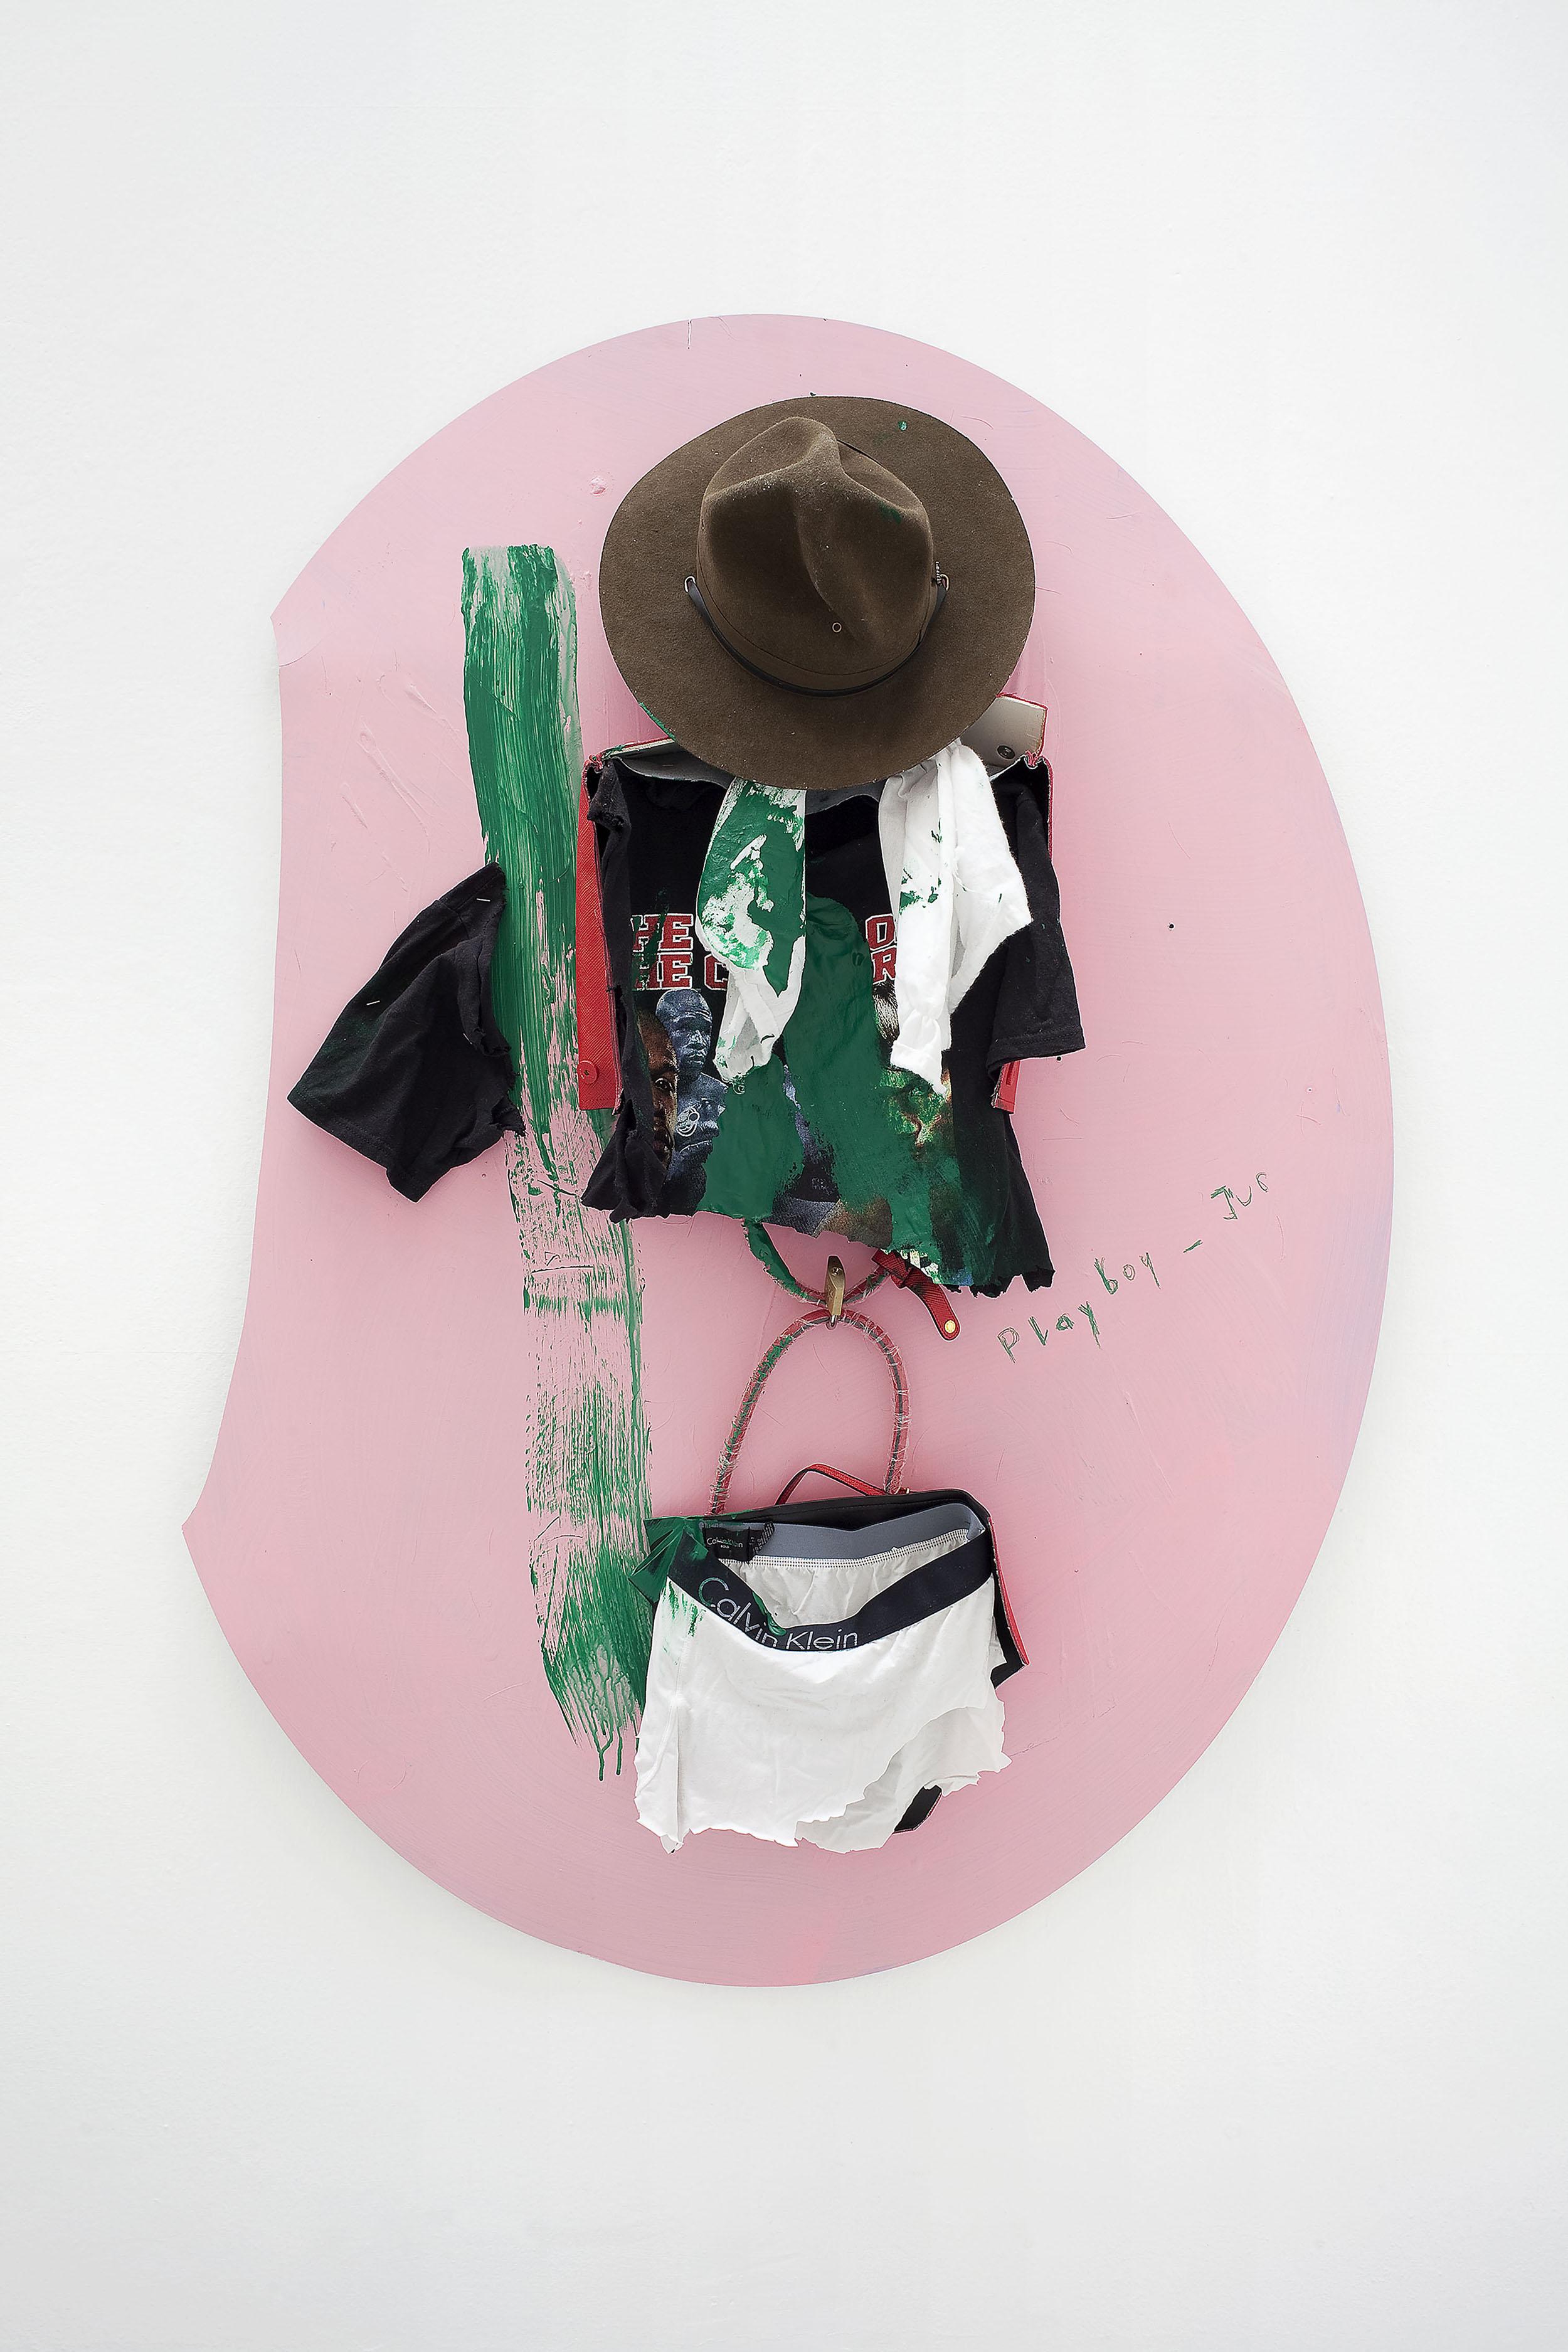 8 - Yves Scherer GP 2015 Aluminium Dibond Prada Bag T-Shirt Pants and Acrylic Paint 135x102 cm - Courtesy Studiolo Milan - Photo Filippo Armellin